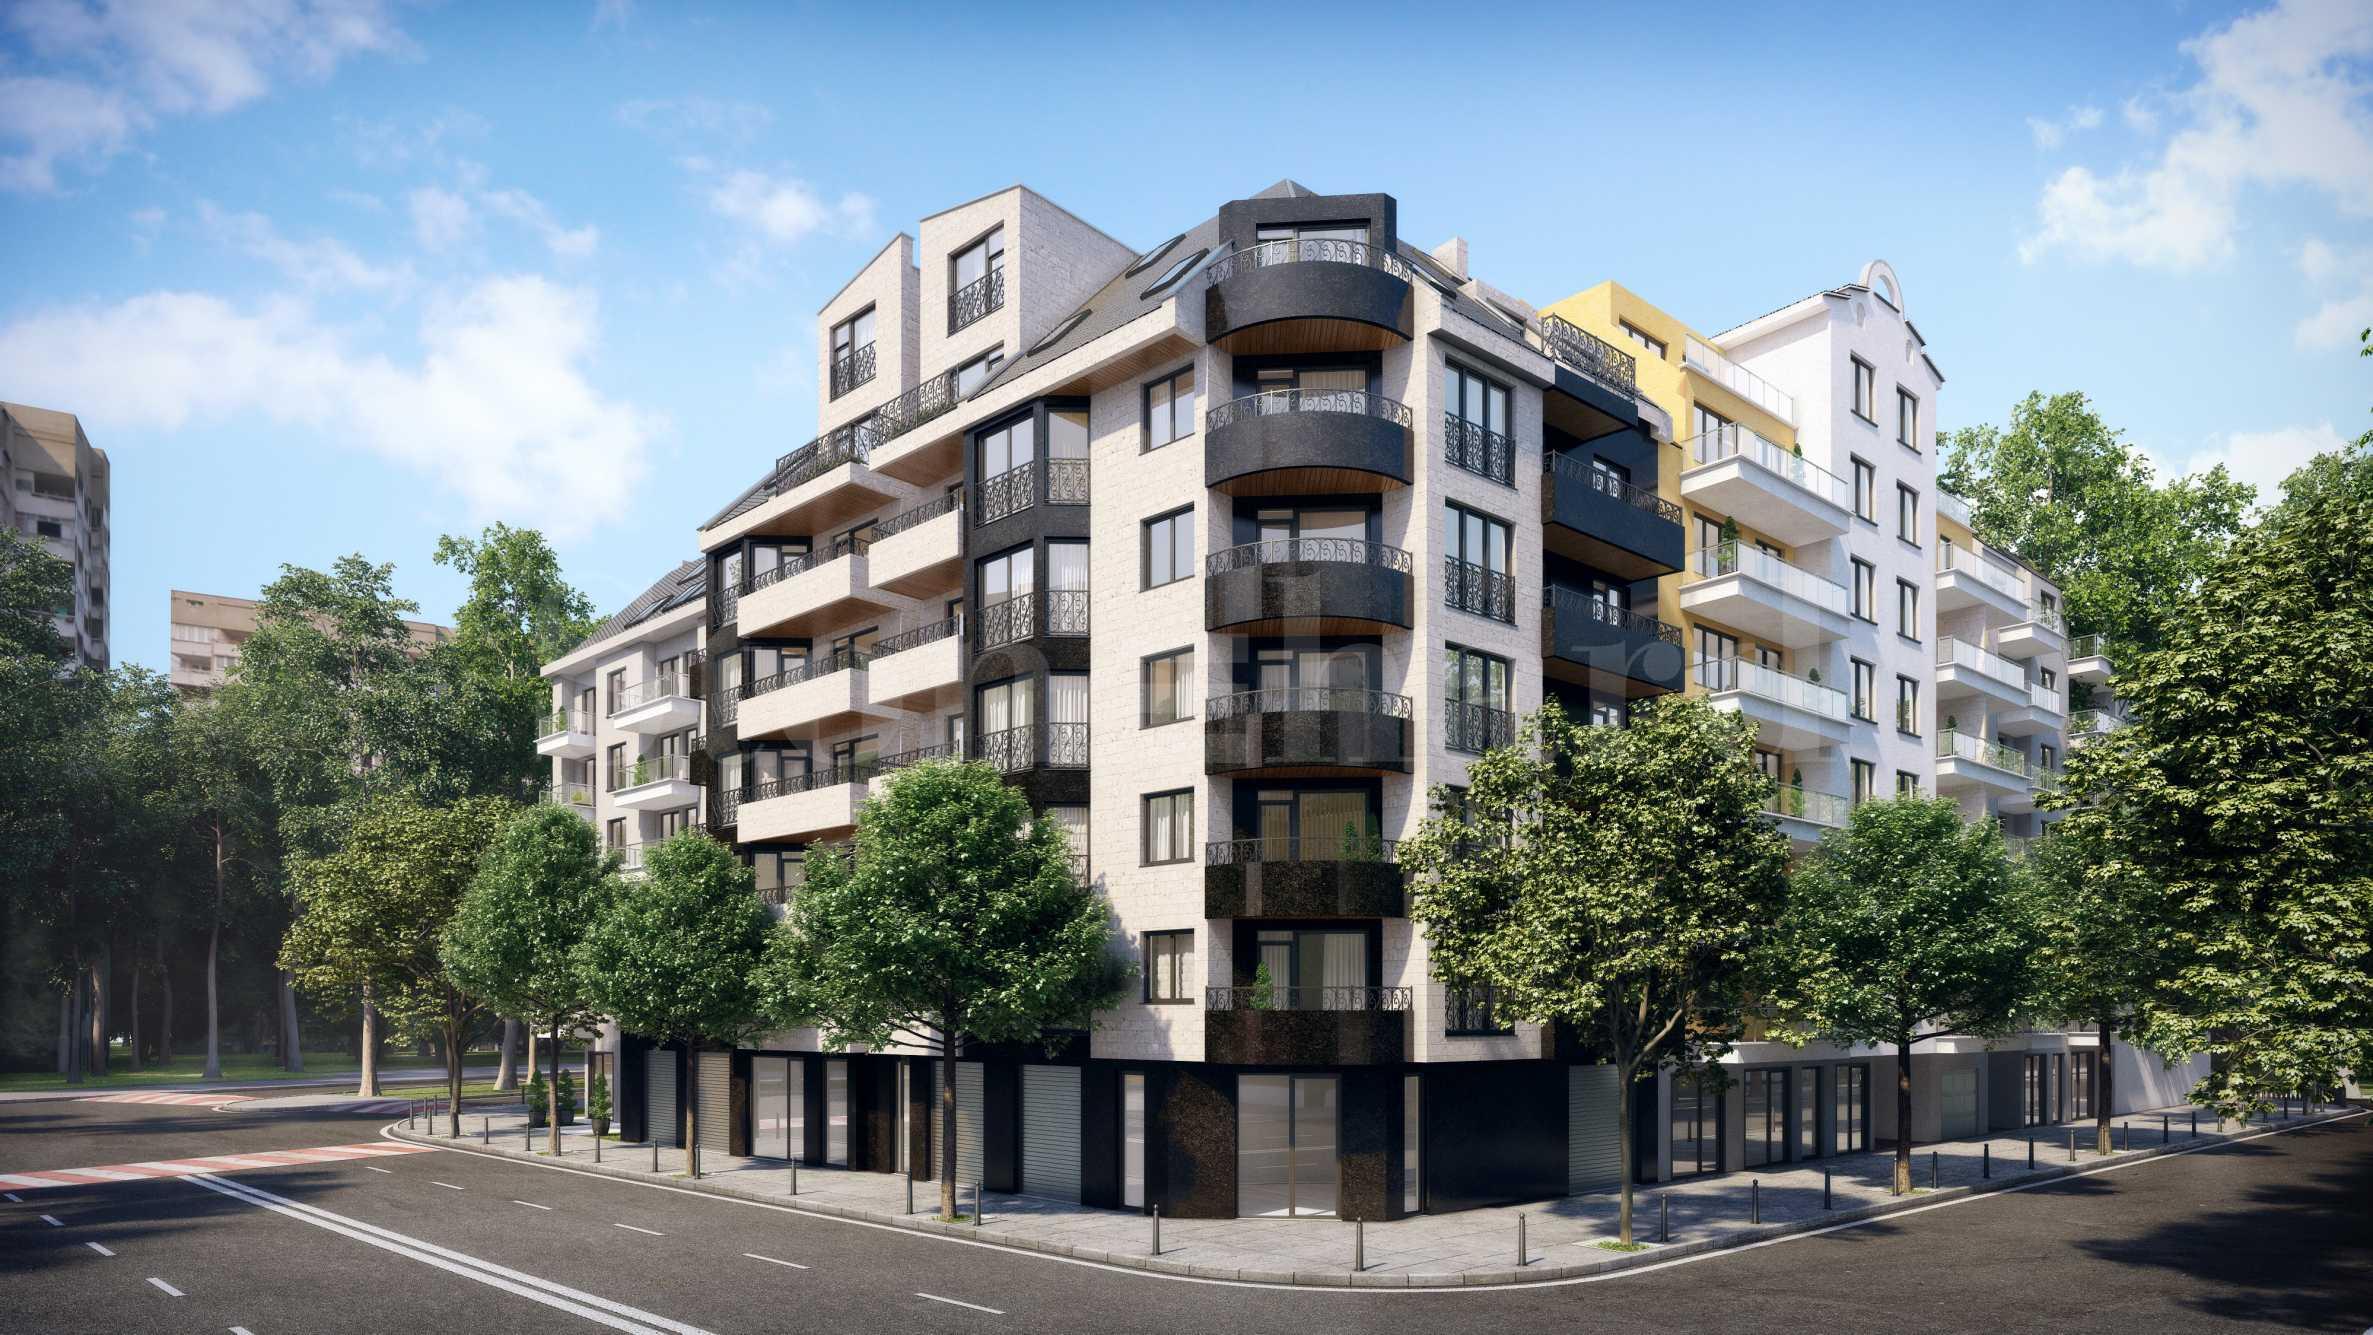 Последни нови апартаменти на атрактивни цени в хубав квартал1 - Stonehard